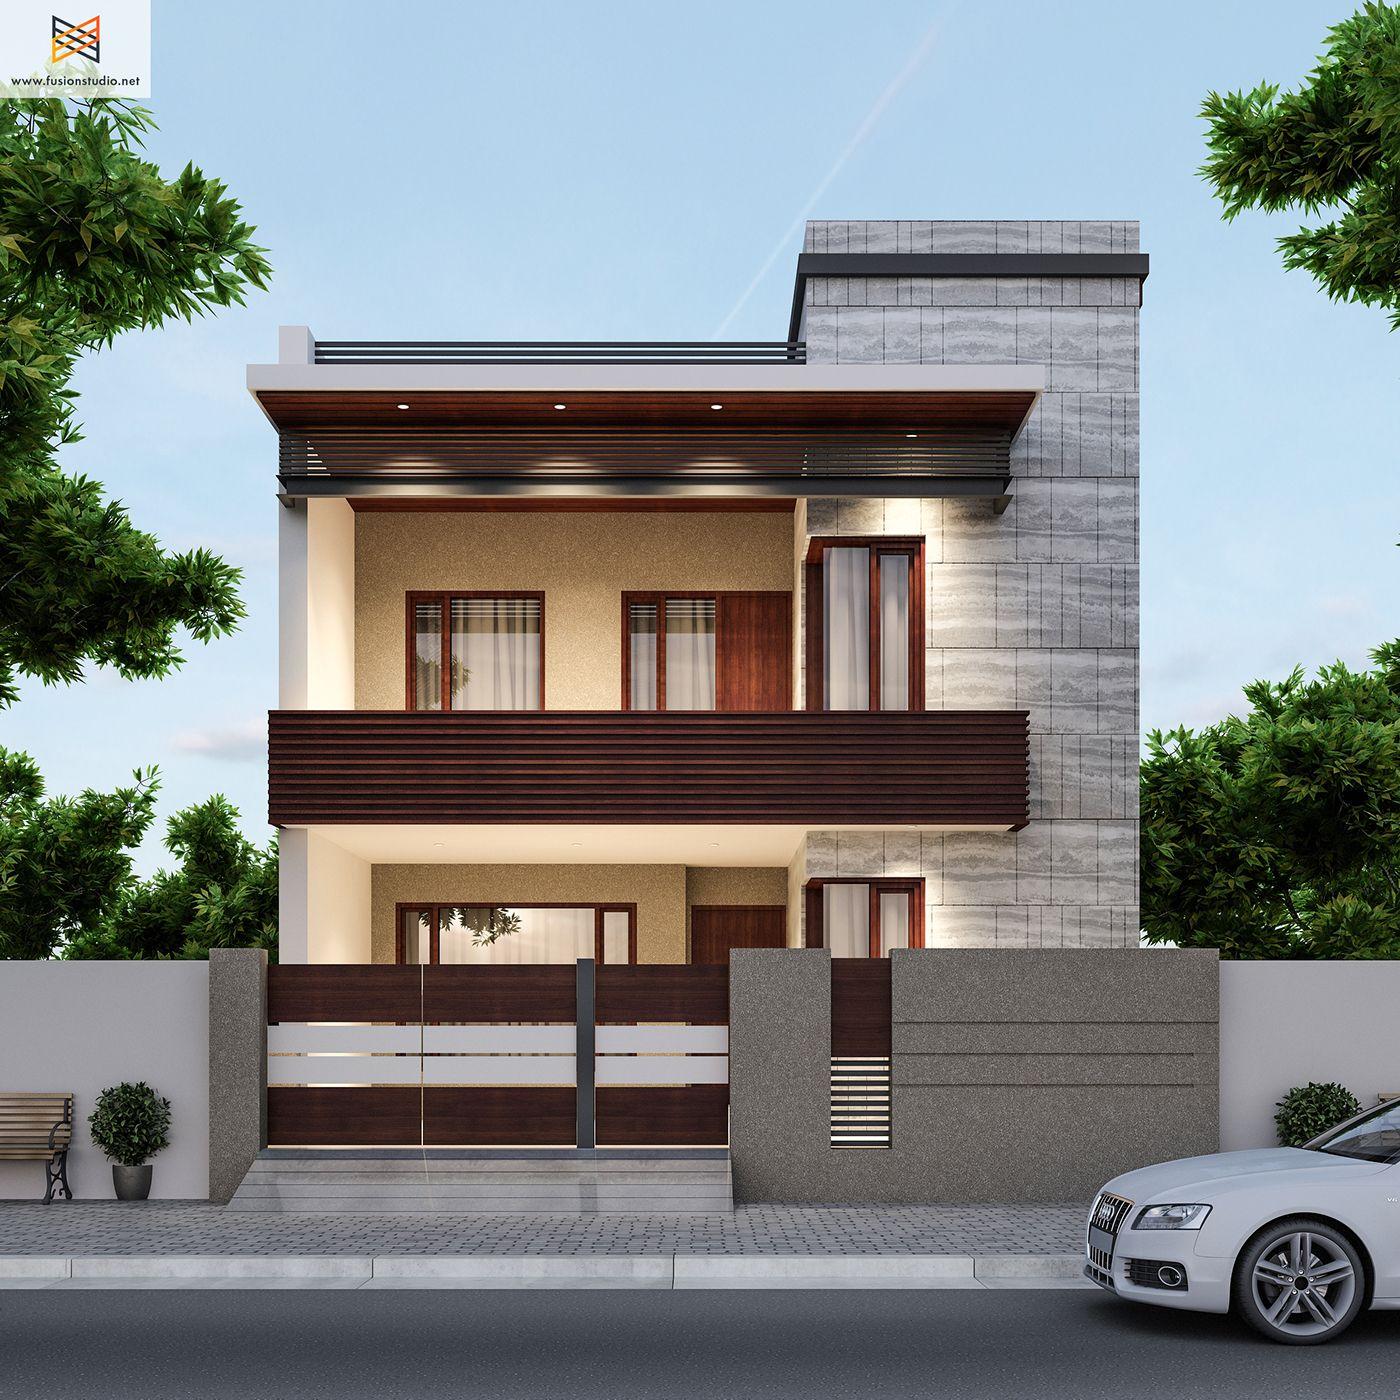 Home Design Ideas India: House Design At Ludhiana, India